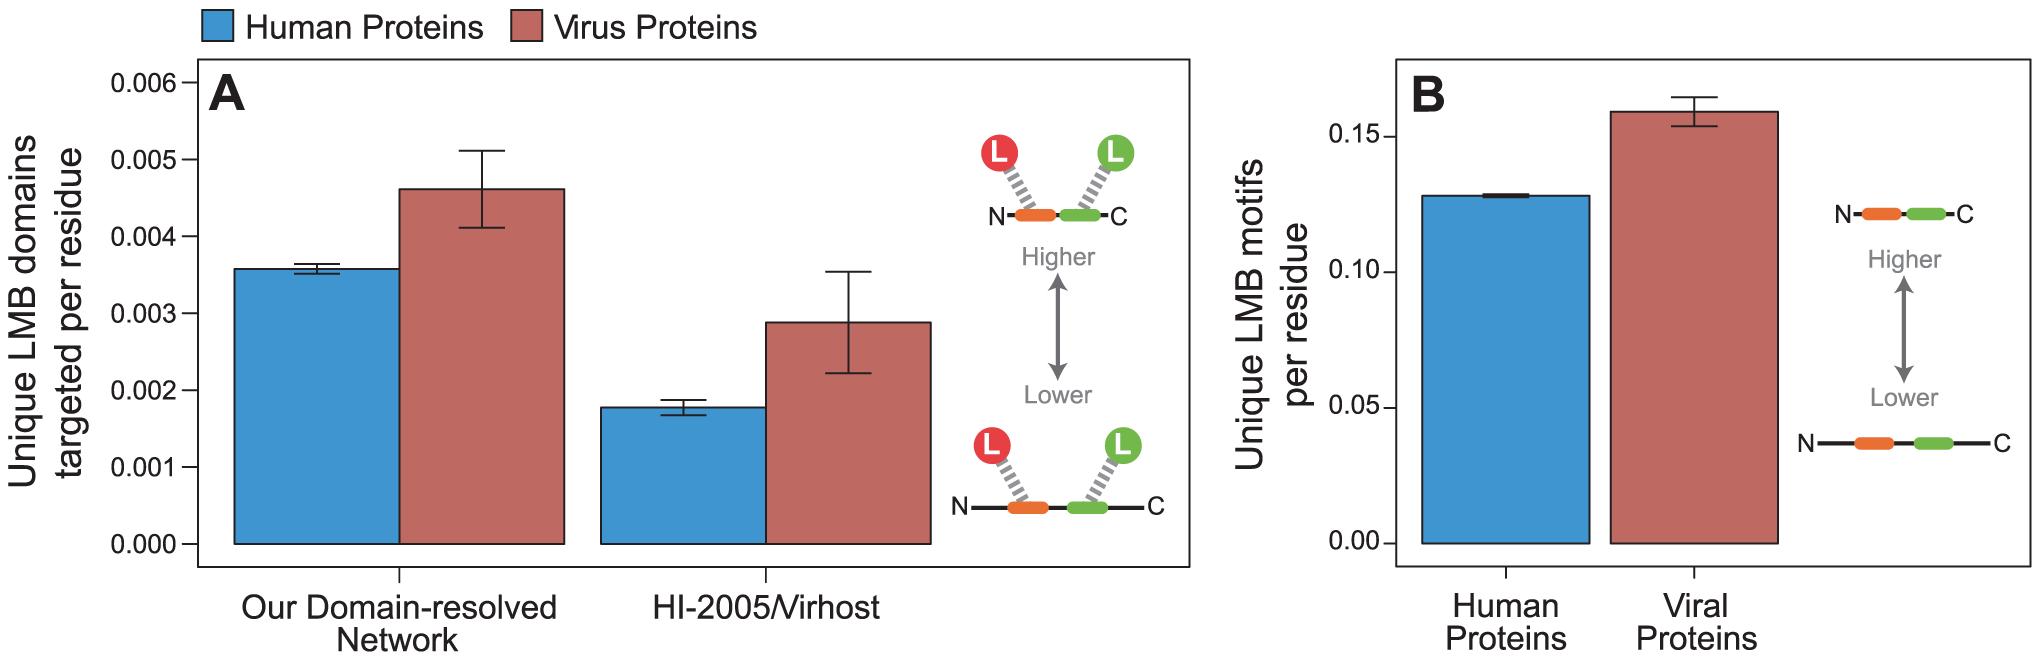 Viral proteins target LMB domains at greater density than human proteins.